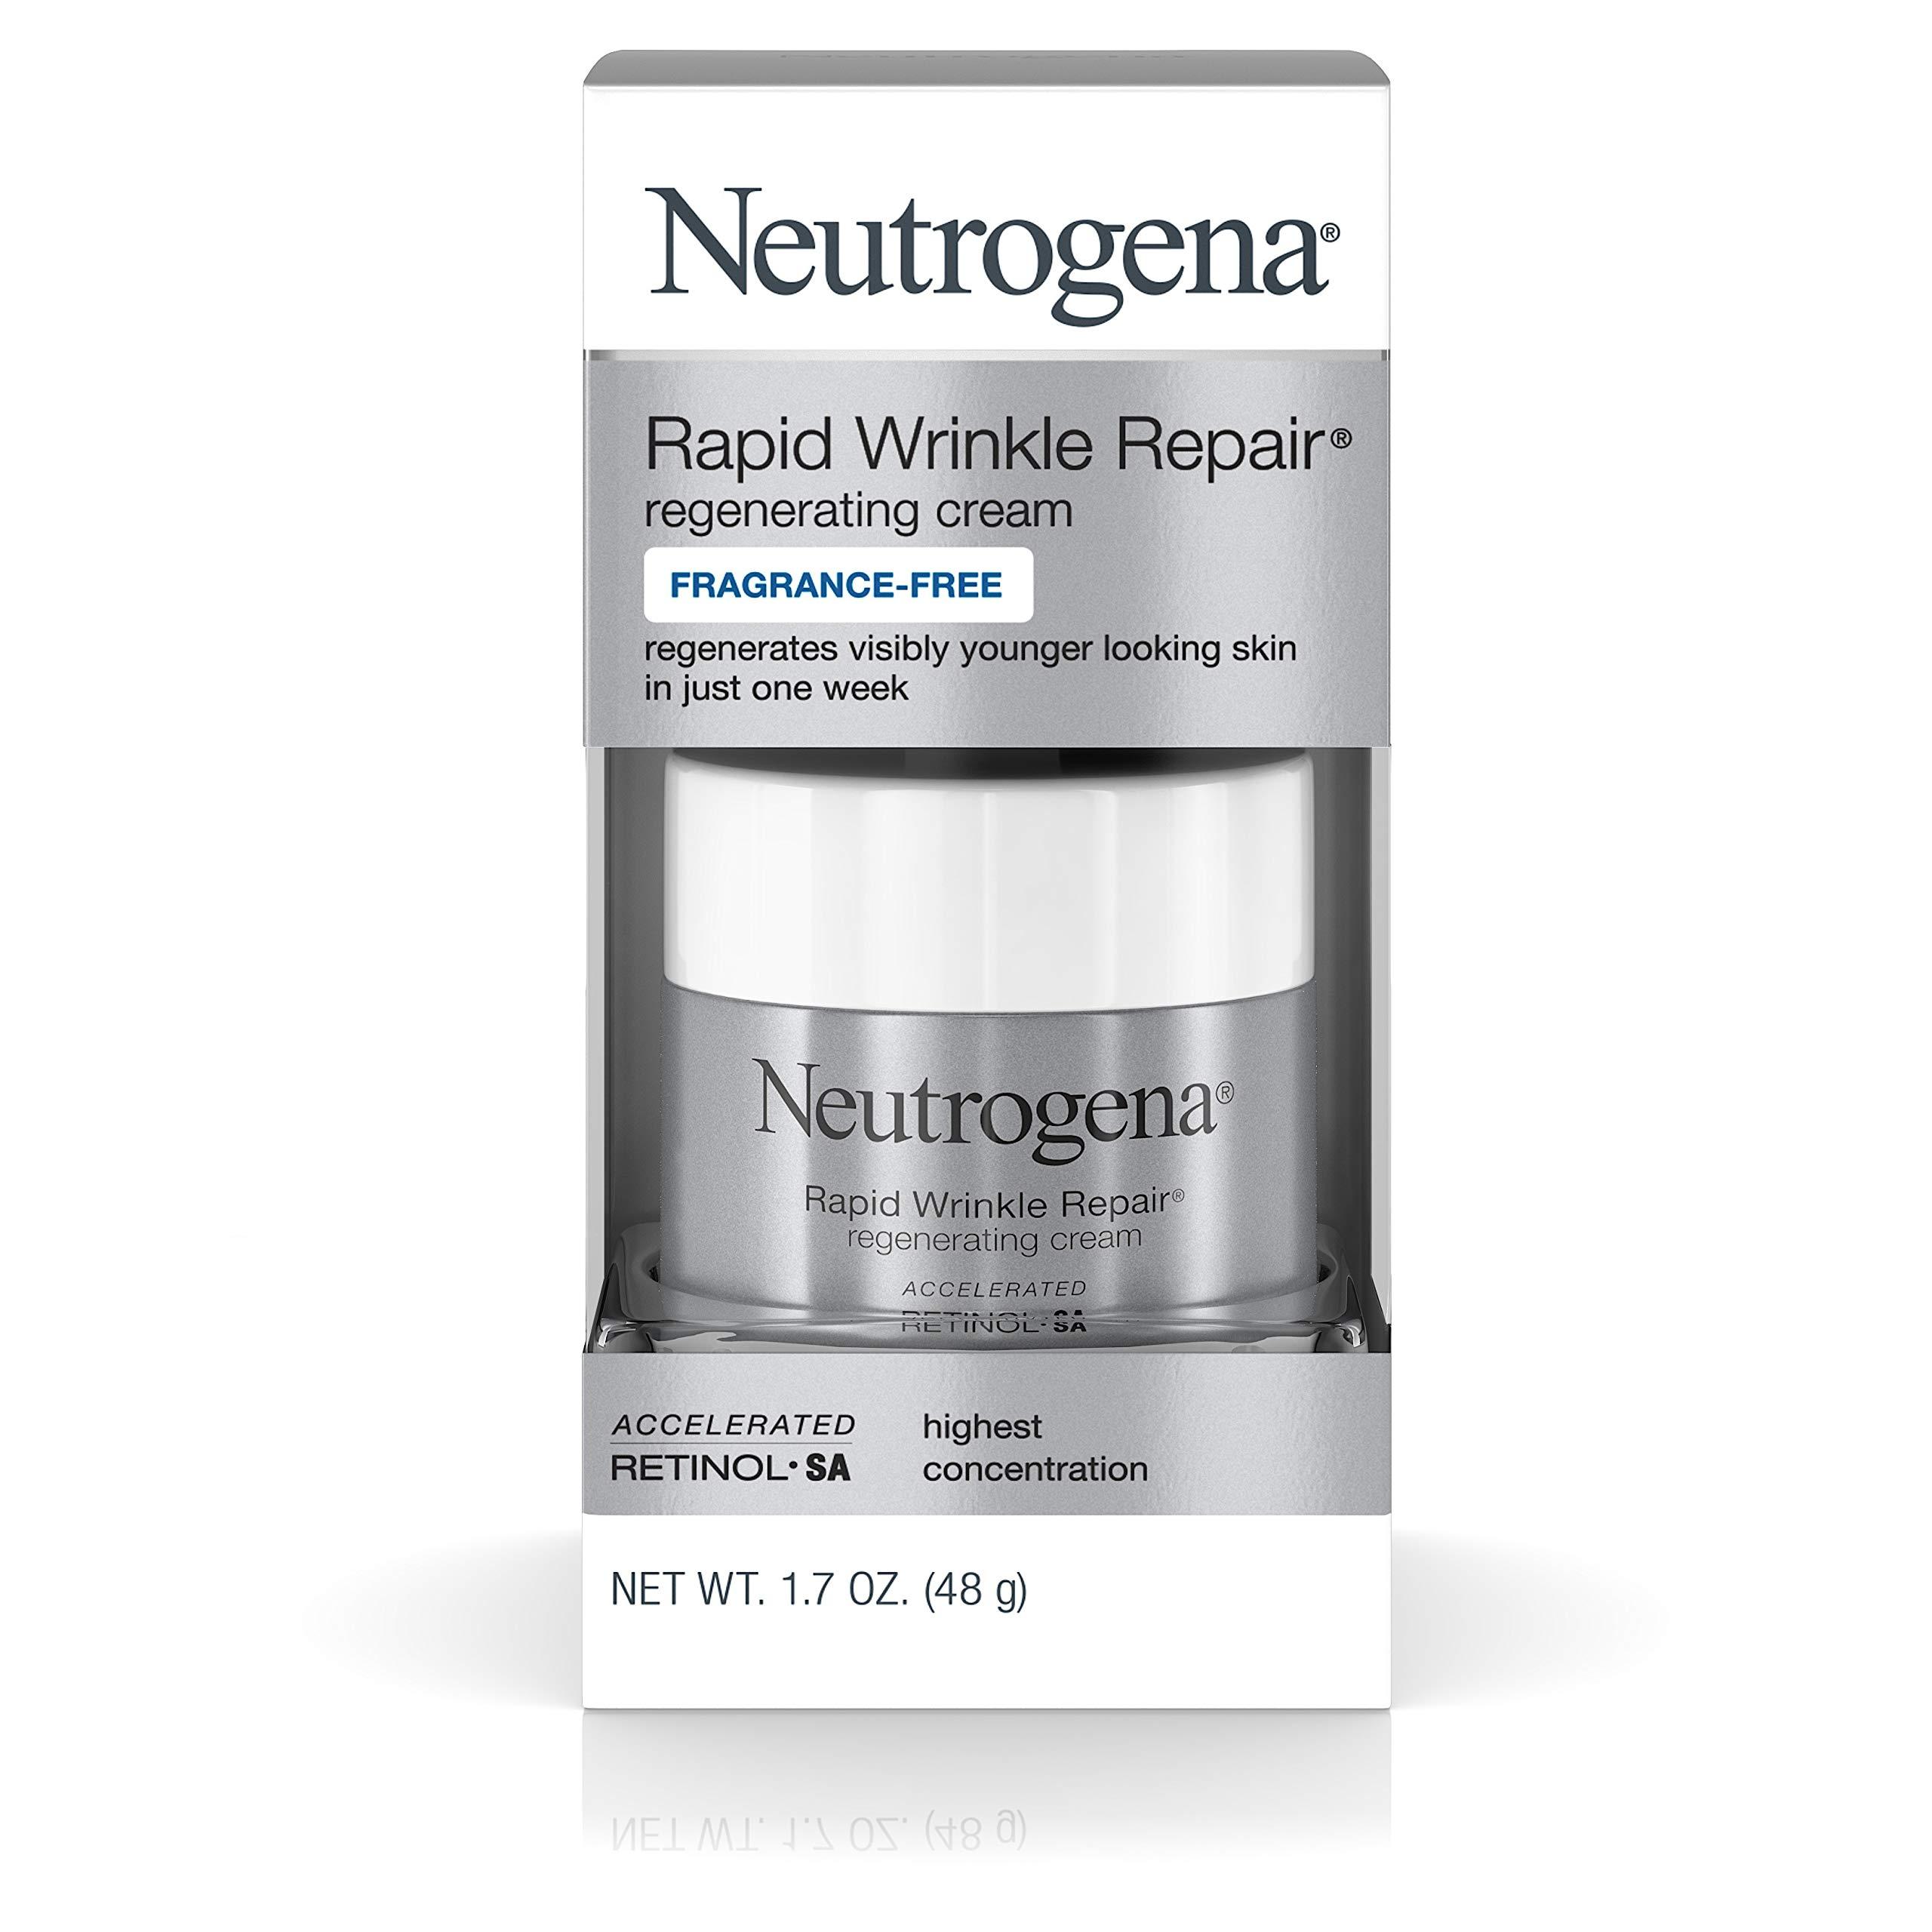 Neutrogena Rapid Wrinkle Repair Hyaluronic Acid Retinol Cream, Anti Wrinkle Cream, Face Moisturizer, Neck Cream & Dark Spot Remover for Face - Day & Night Cream with Hyaluronic Acid & Retinol, 1.7 oz by Neutrogena (Image #1)